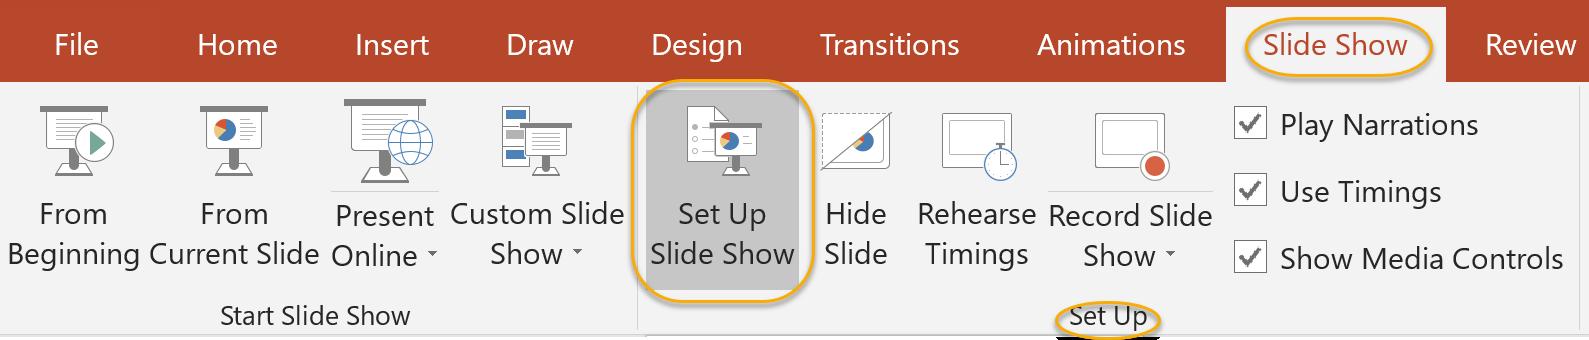 Set Up Slide Show Command